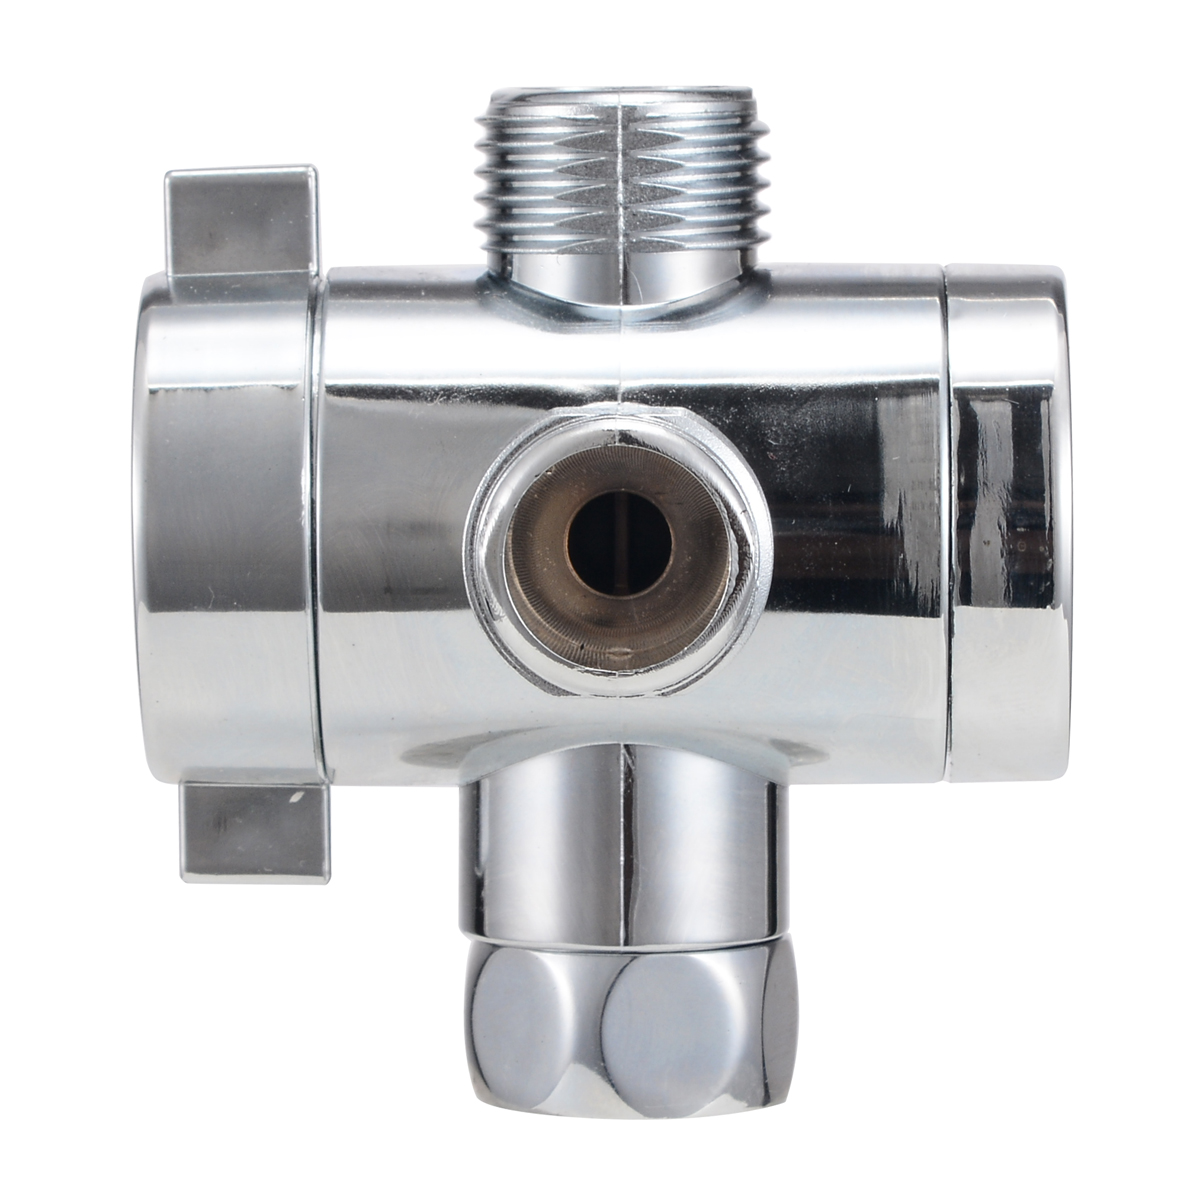 1/2″ T-adapter Bath Adjustable Shower Head Connector Shower Head Diverter Valve For Toilet Bidet Shower Bathroom Tool Part